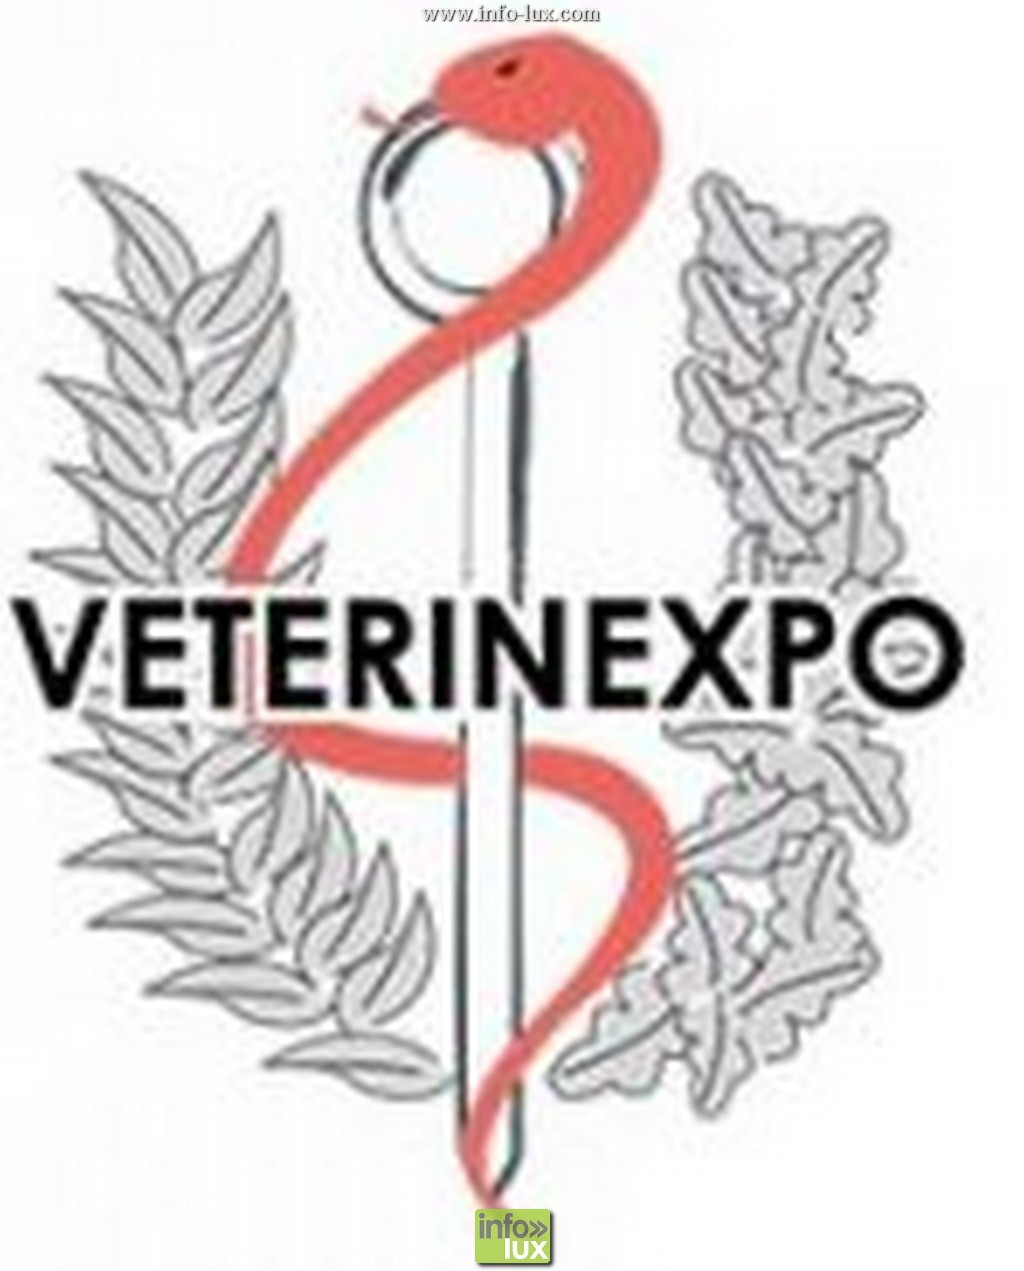 Vétérinexpo – Lec – Libramont